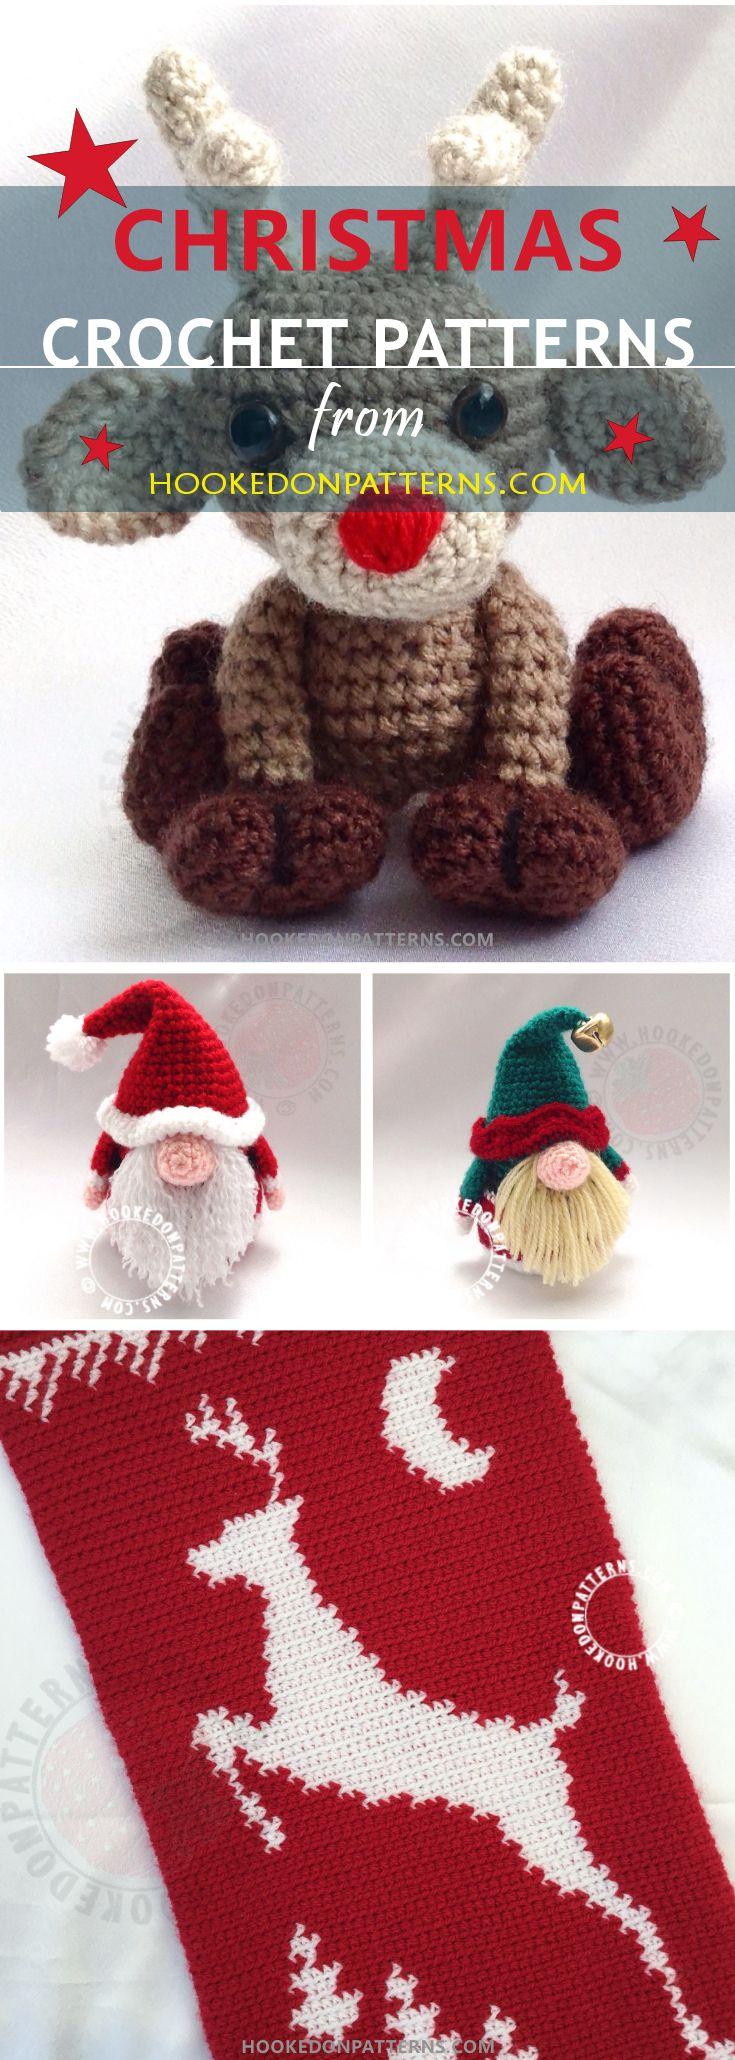 Christmas Crochet Patterns | Pinterest | Christmas crochet patterns ...